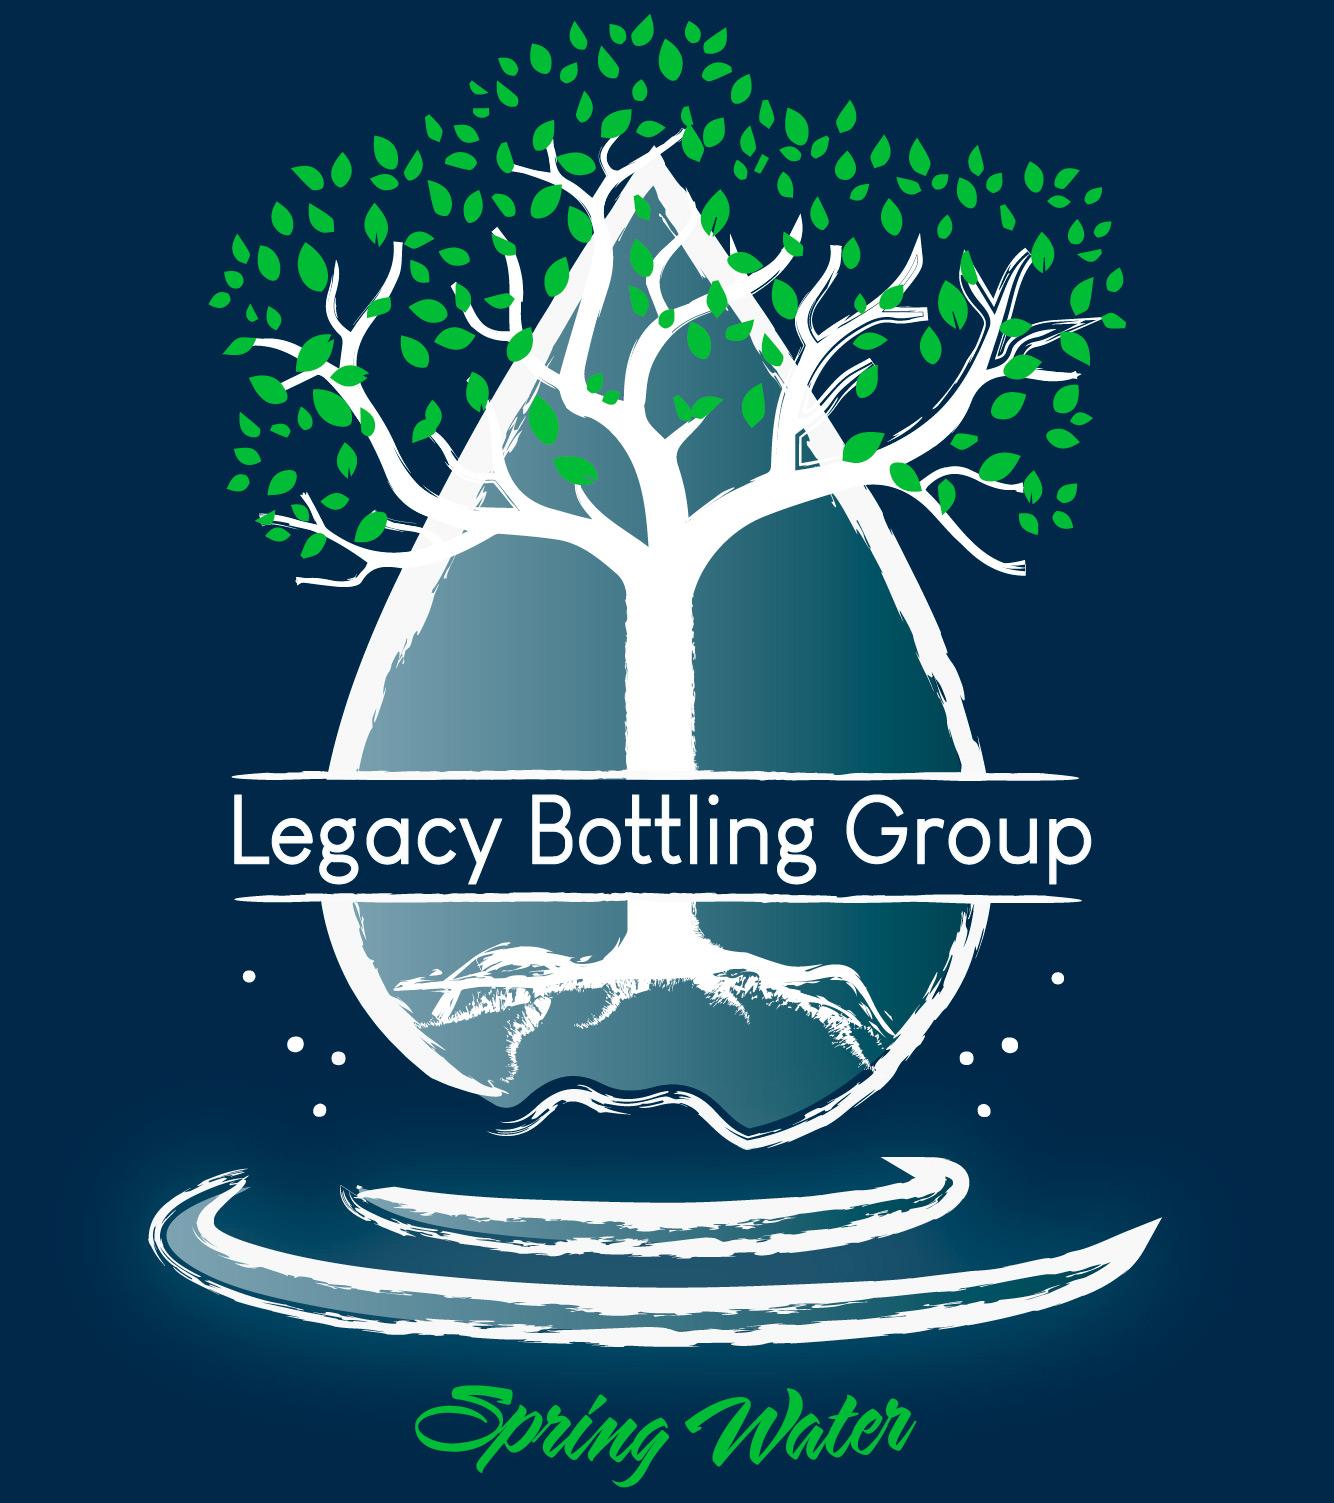 Legacy Bottling Group